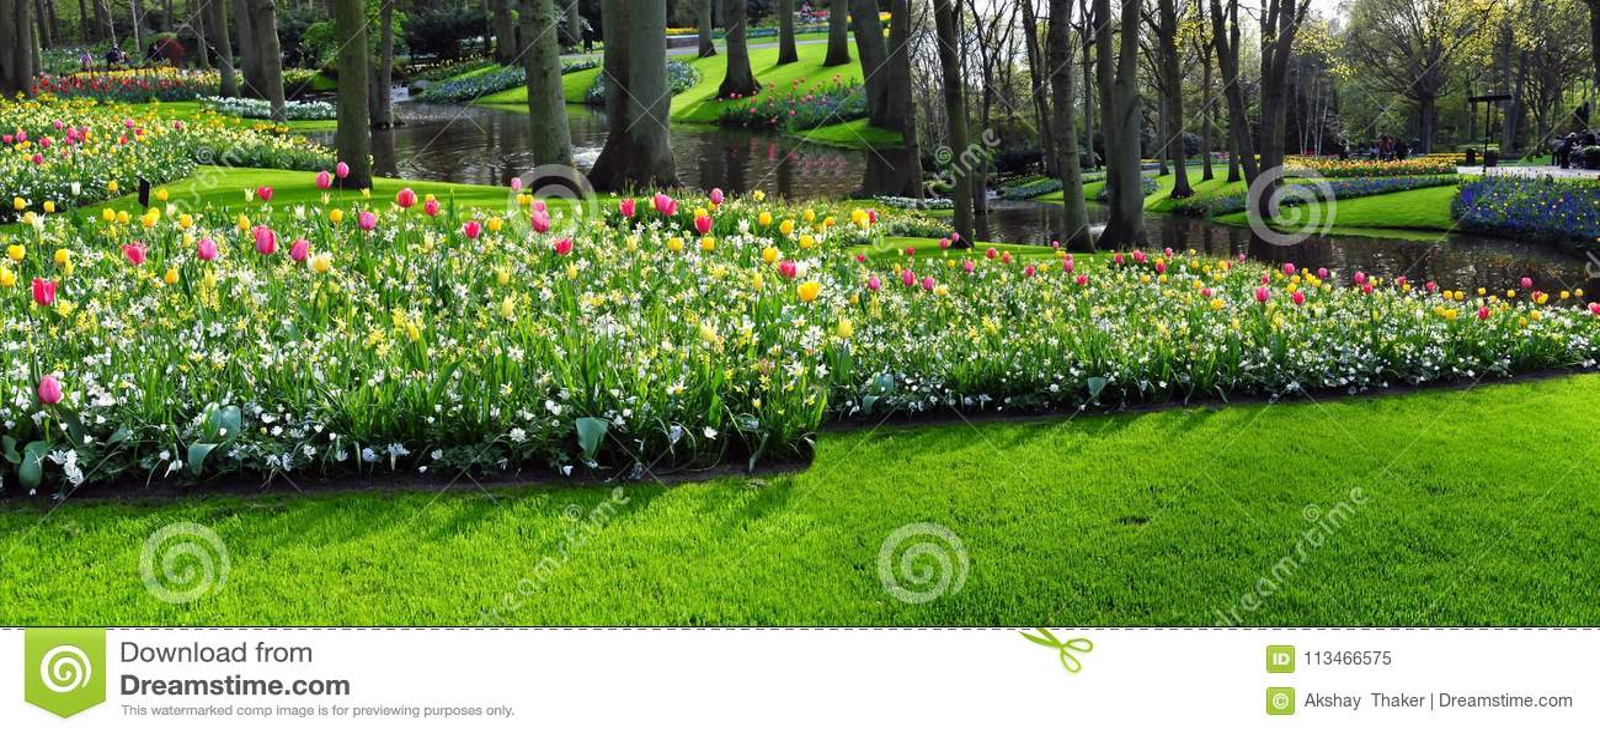 Keukenhof Garden Known As The Garden Of Europe Is One Of The World